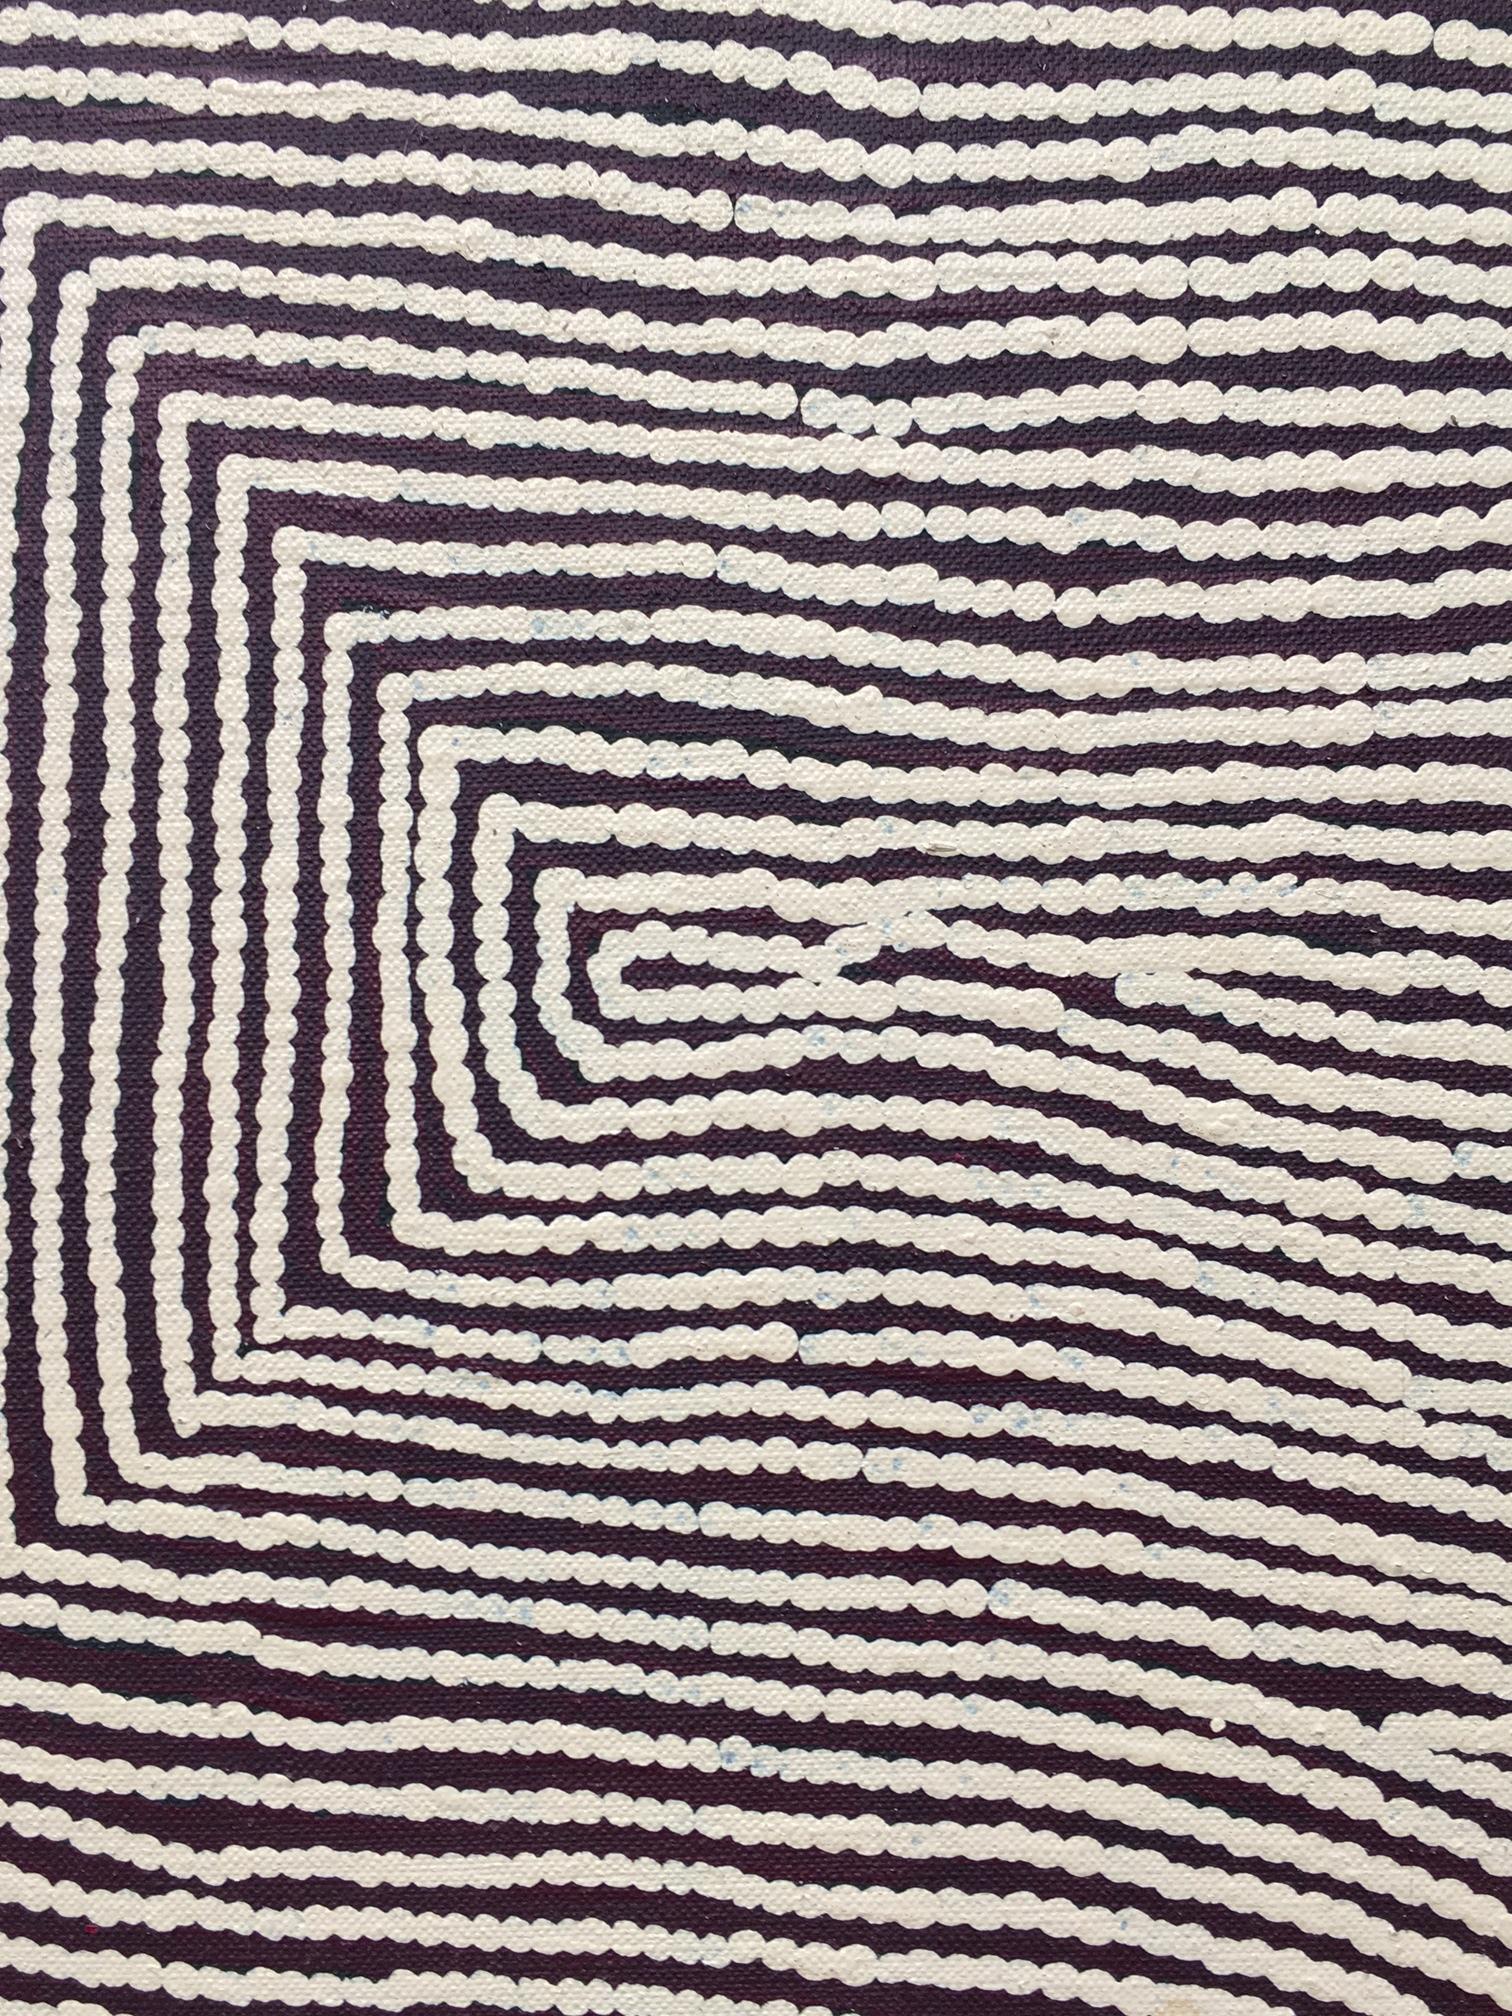 Warlimpirrnga Tjapaltjarri,Untitled, 2015, Acrylic on linen, 244 x 183 cm, Salon 94